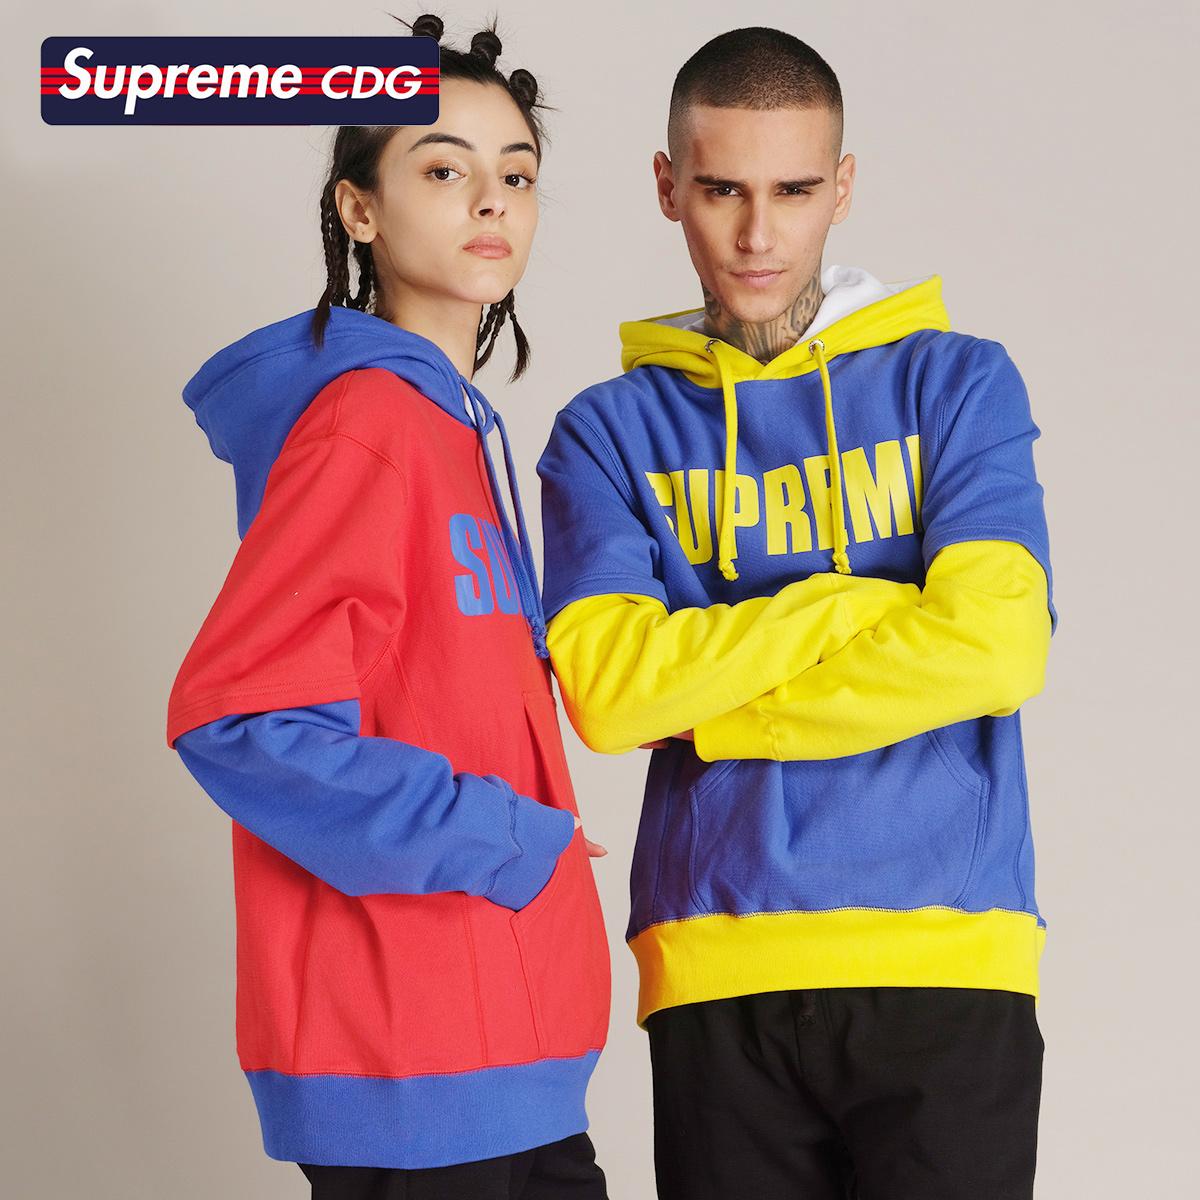 Supreme CDG 2020年春季新品時尚撞色衛衣男女同款運動風街頭衛衣